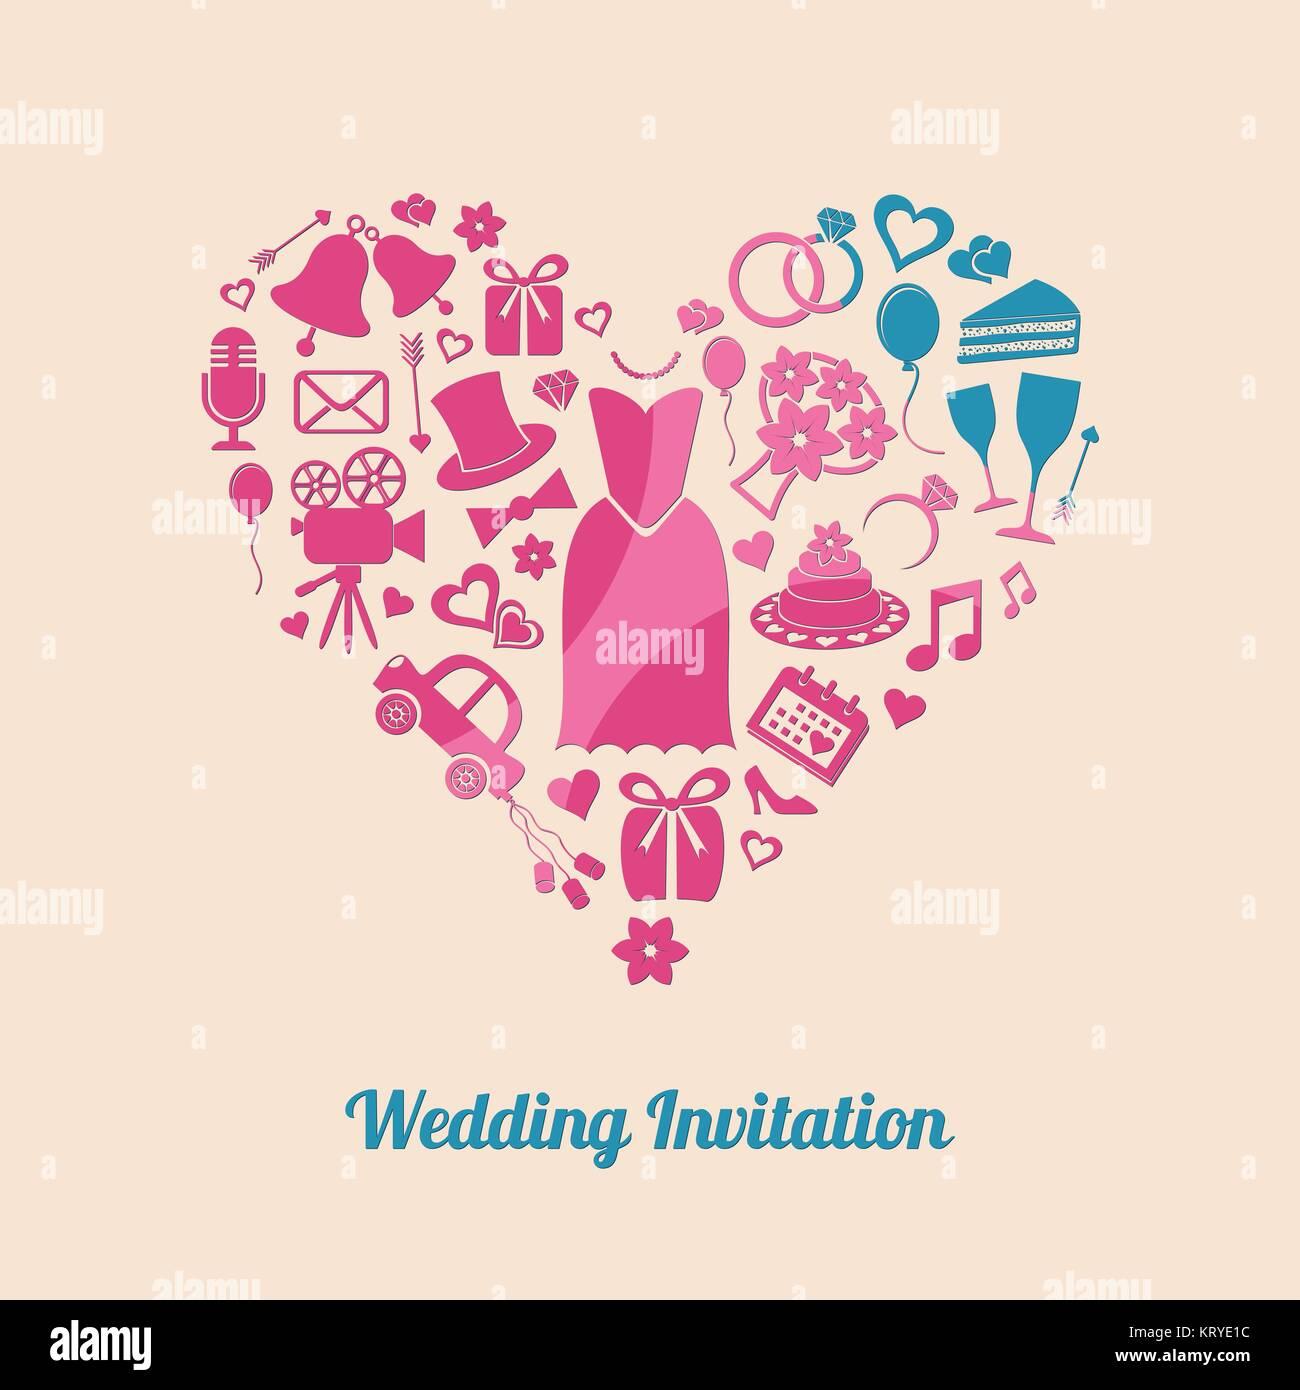 Wedding Bells Illustration Stock Photos & Wedding Bells Illustration ...